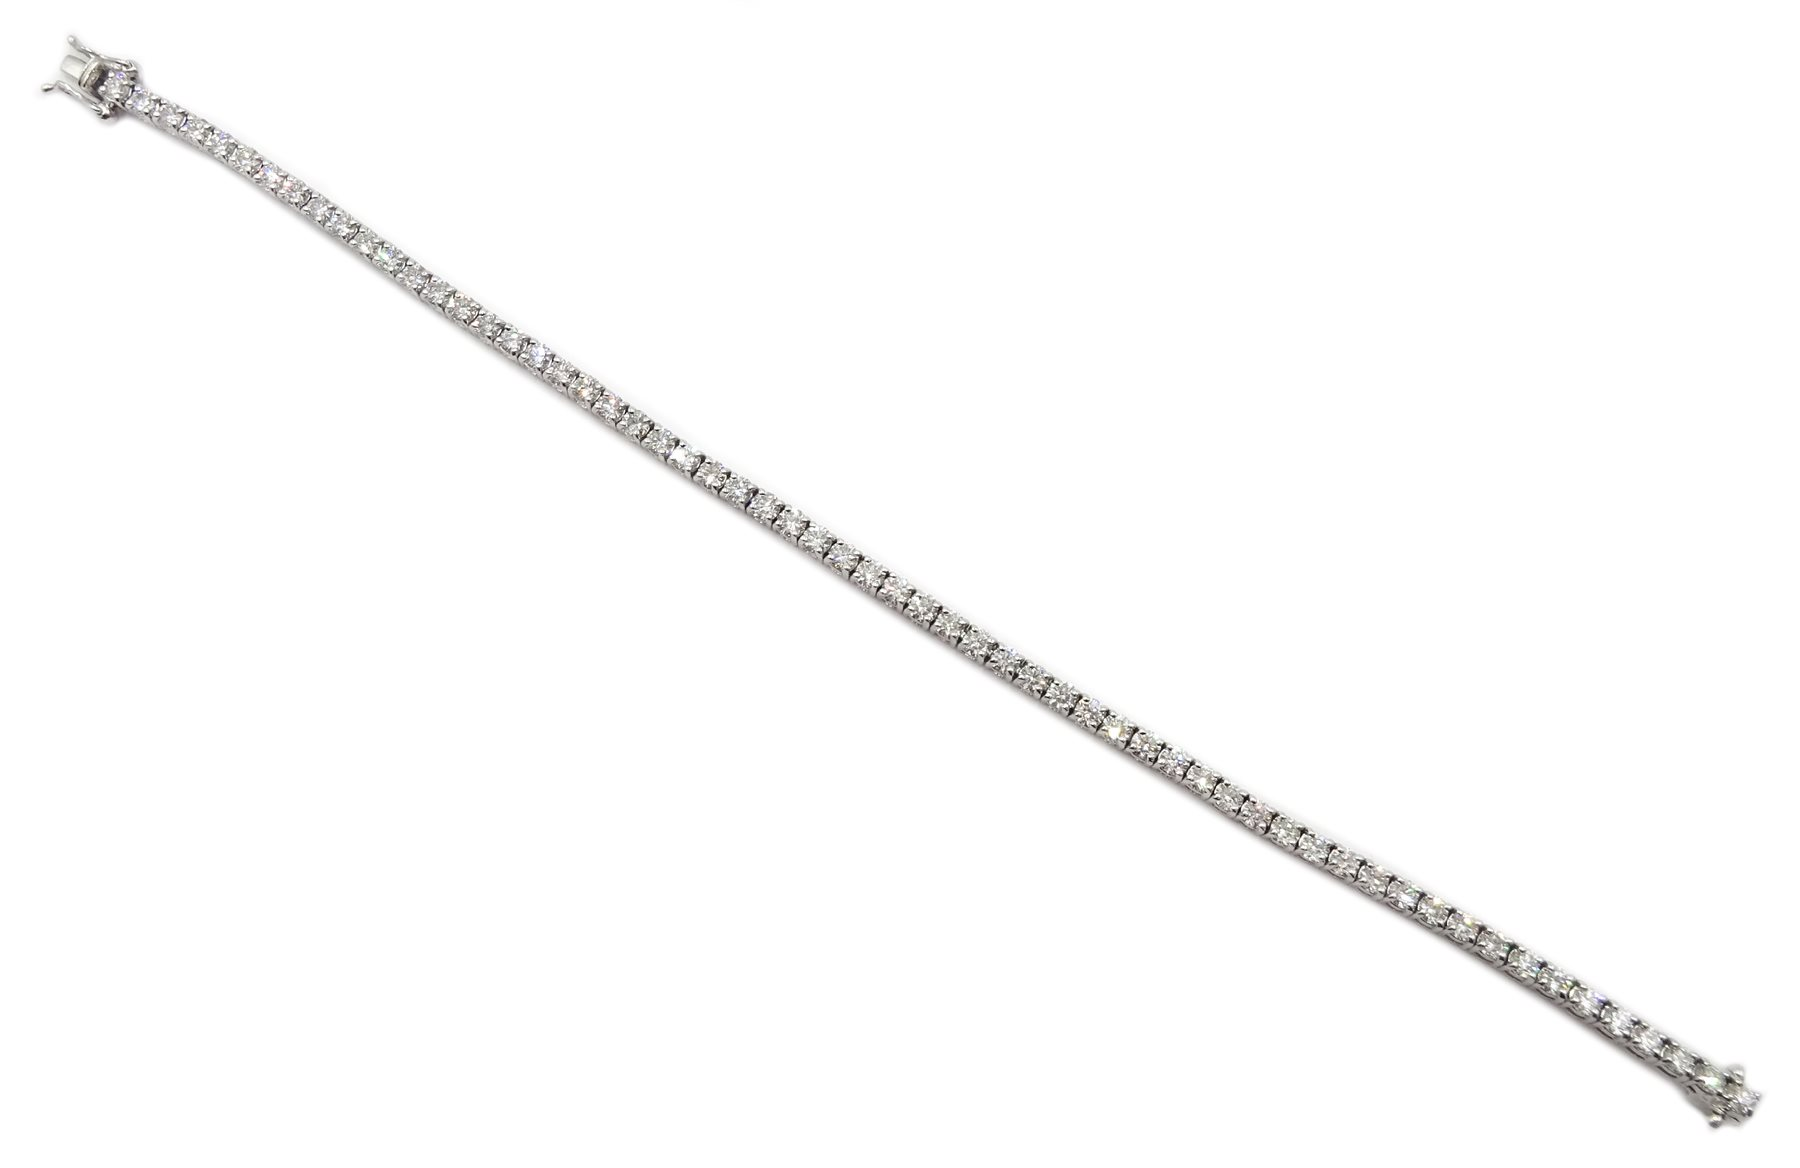 18ct white gold diamond line bracelet - Image 3 of 5